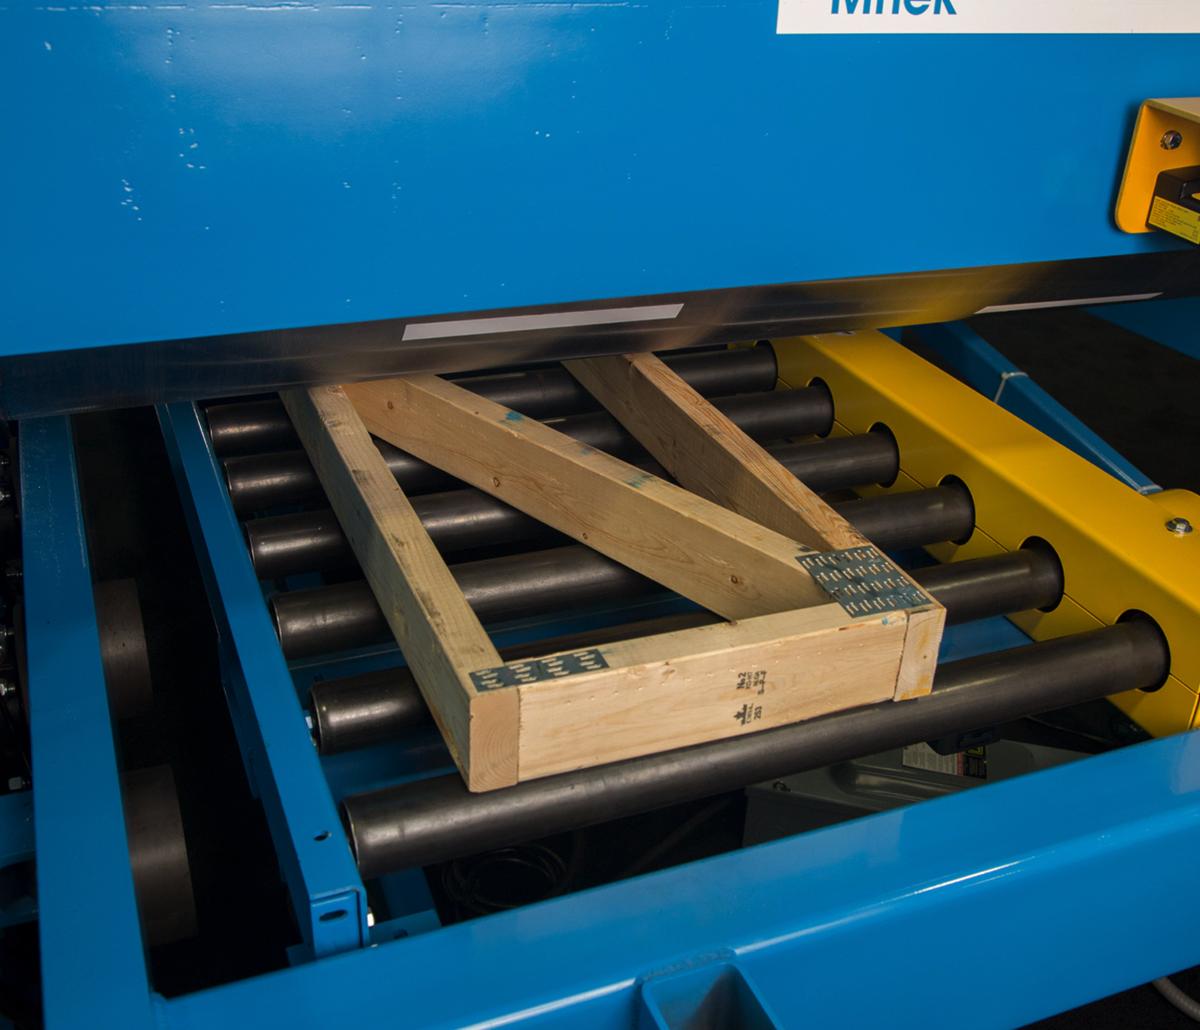 MiTek Railrider Pro Automated Solutions - 2x4s being assembled in Railrider Pro